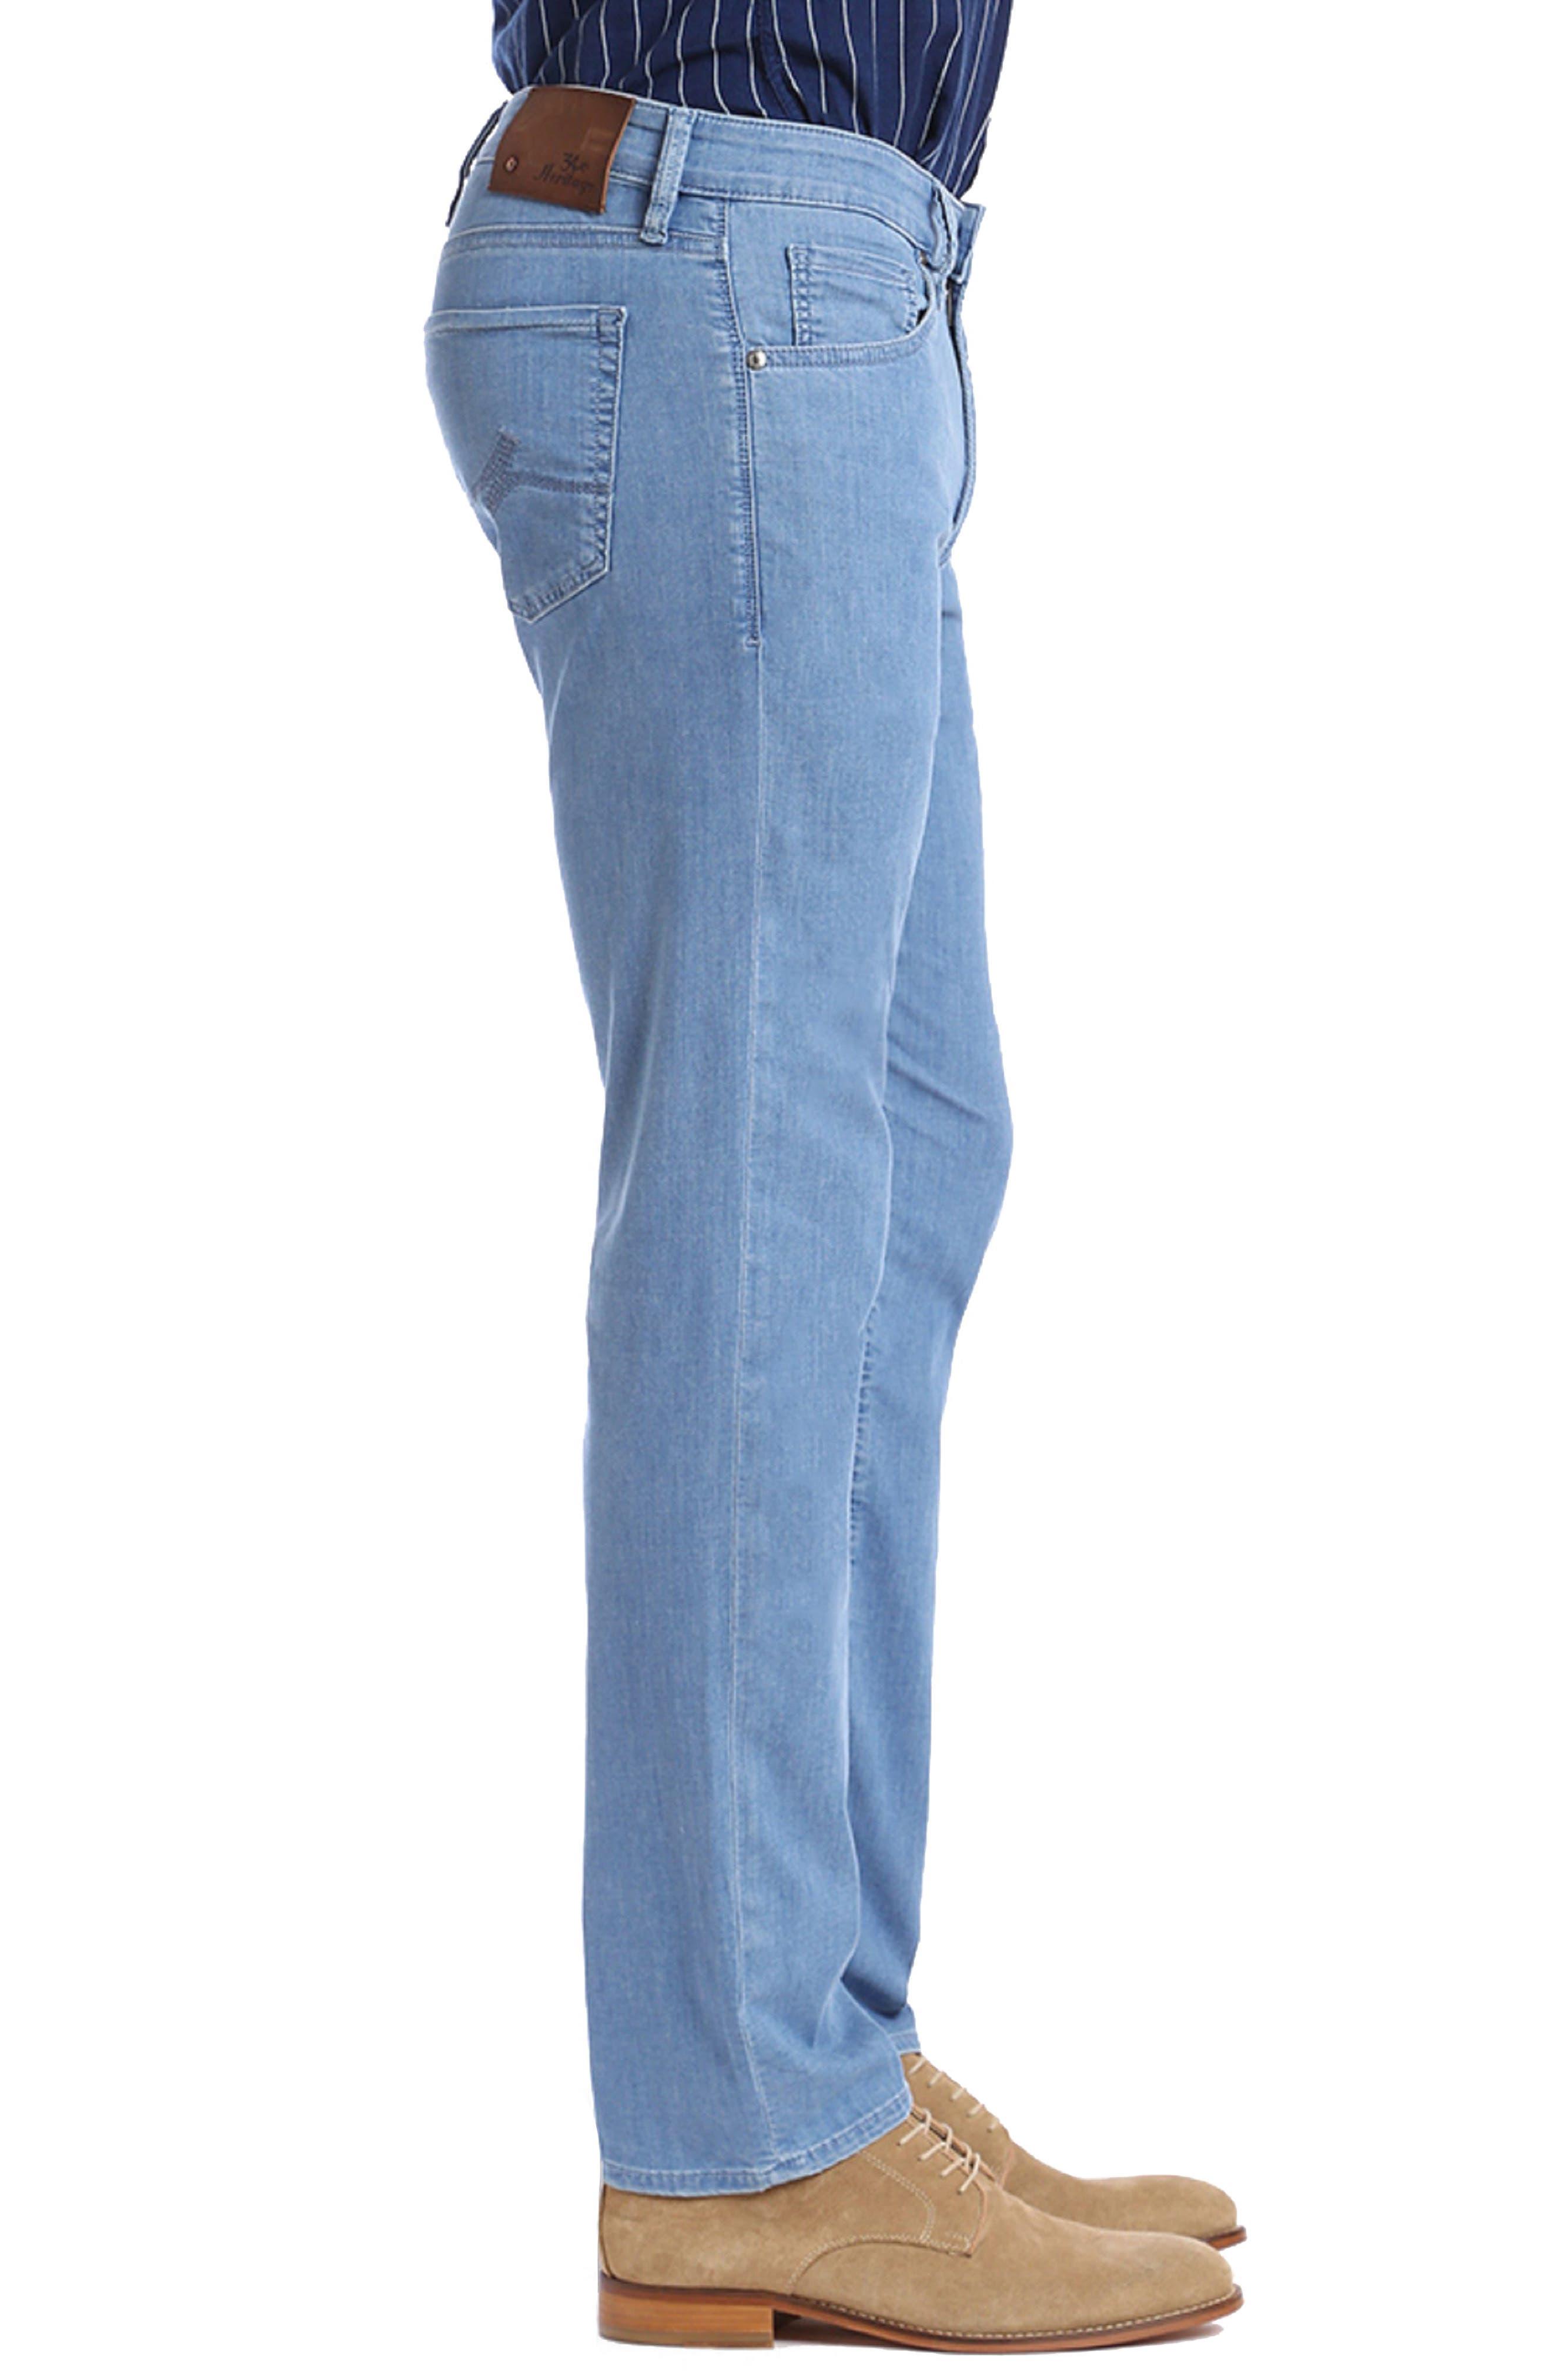 Charisma Relaxed Fit Jeans,                             Alternate thumbnail 3, color,                             Light Maui Denim